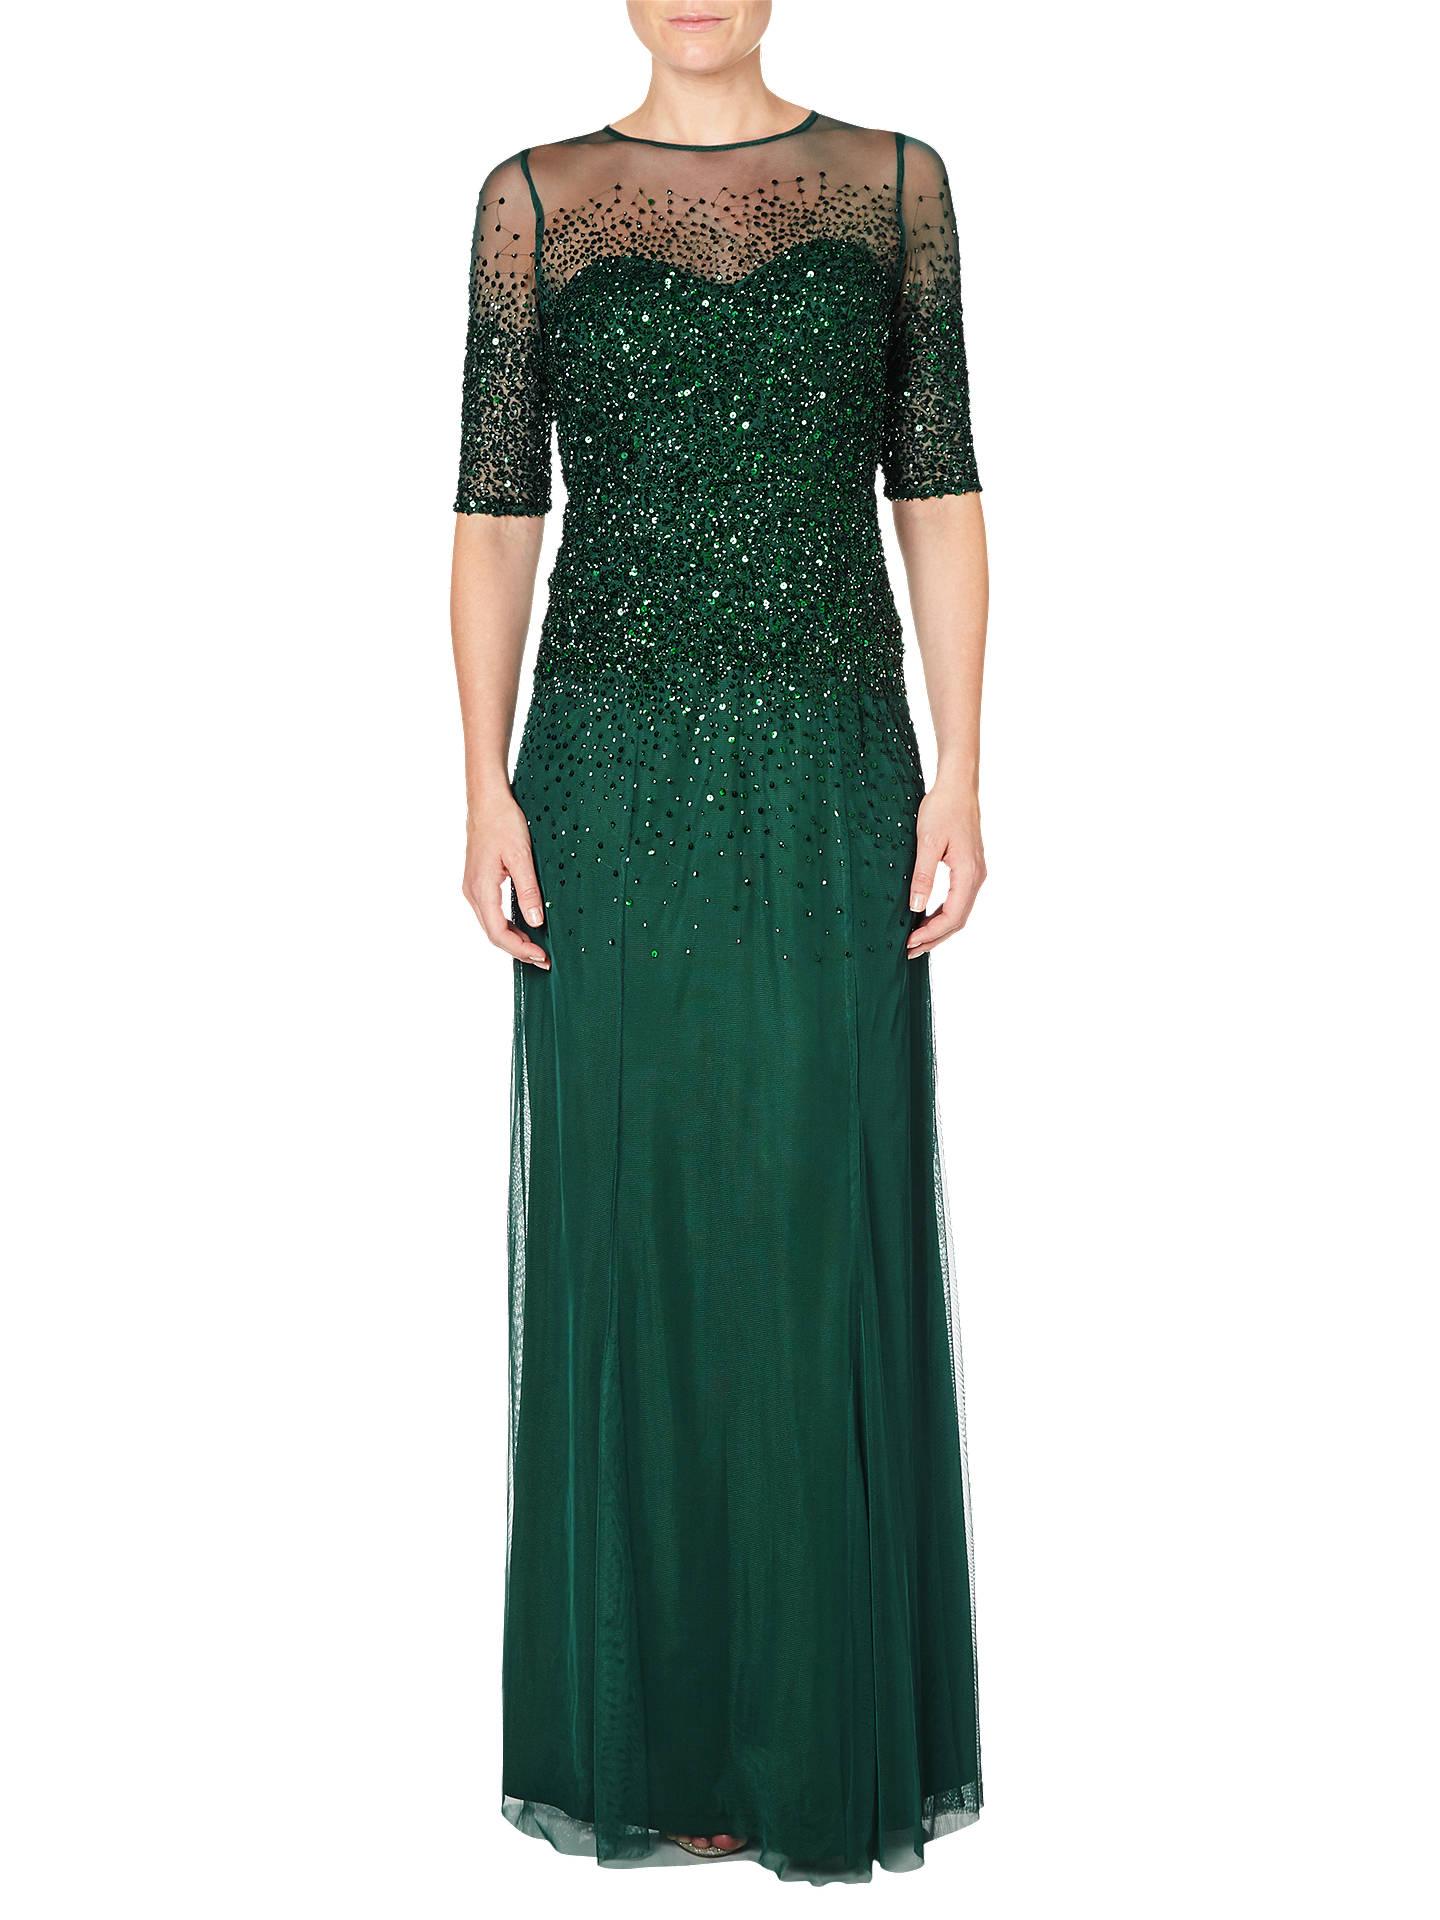 65d8f3ca6b0 BuyAdrianna Papell Beaded Illusion Short Sleeve Dress